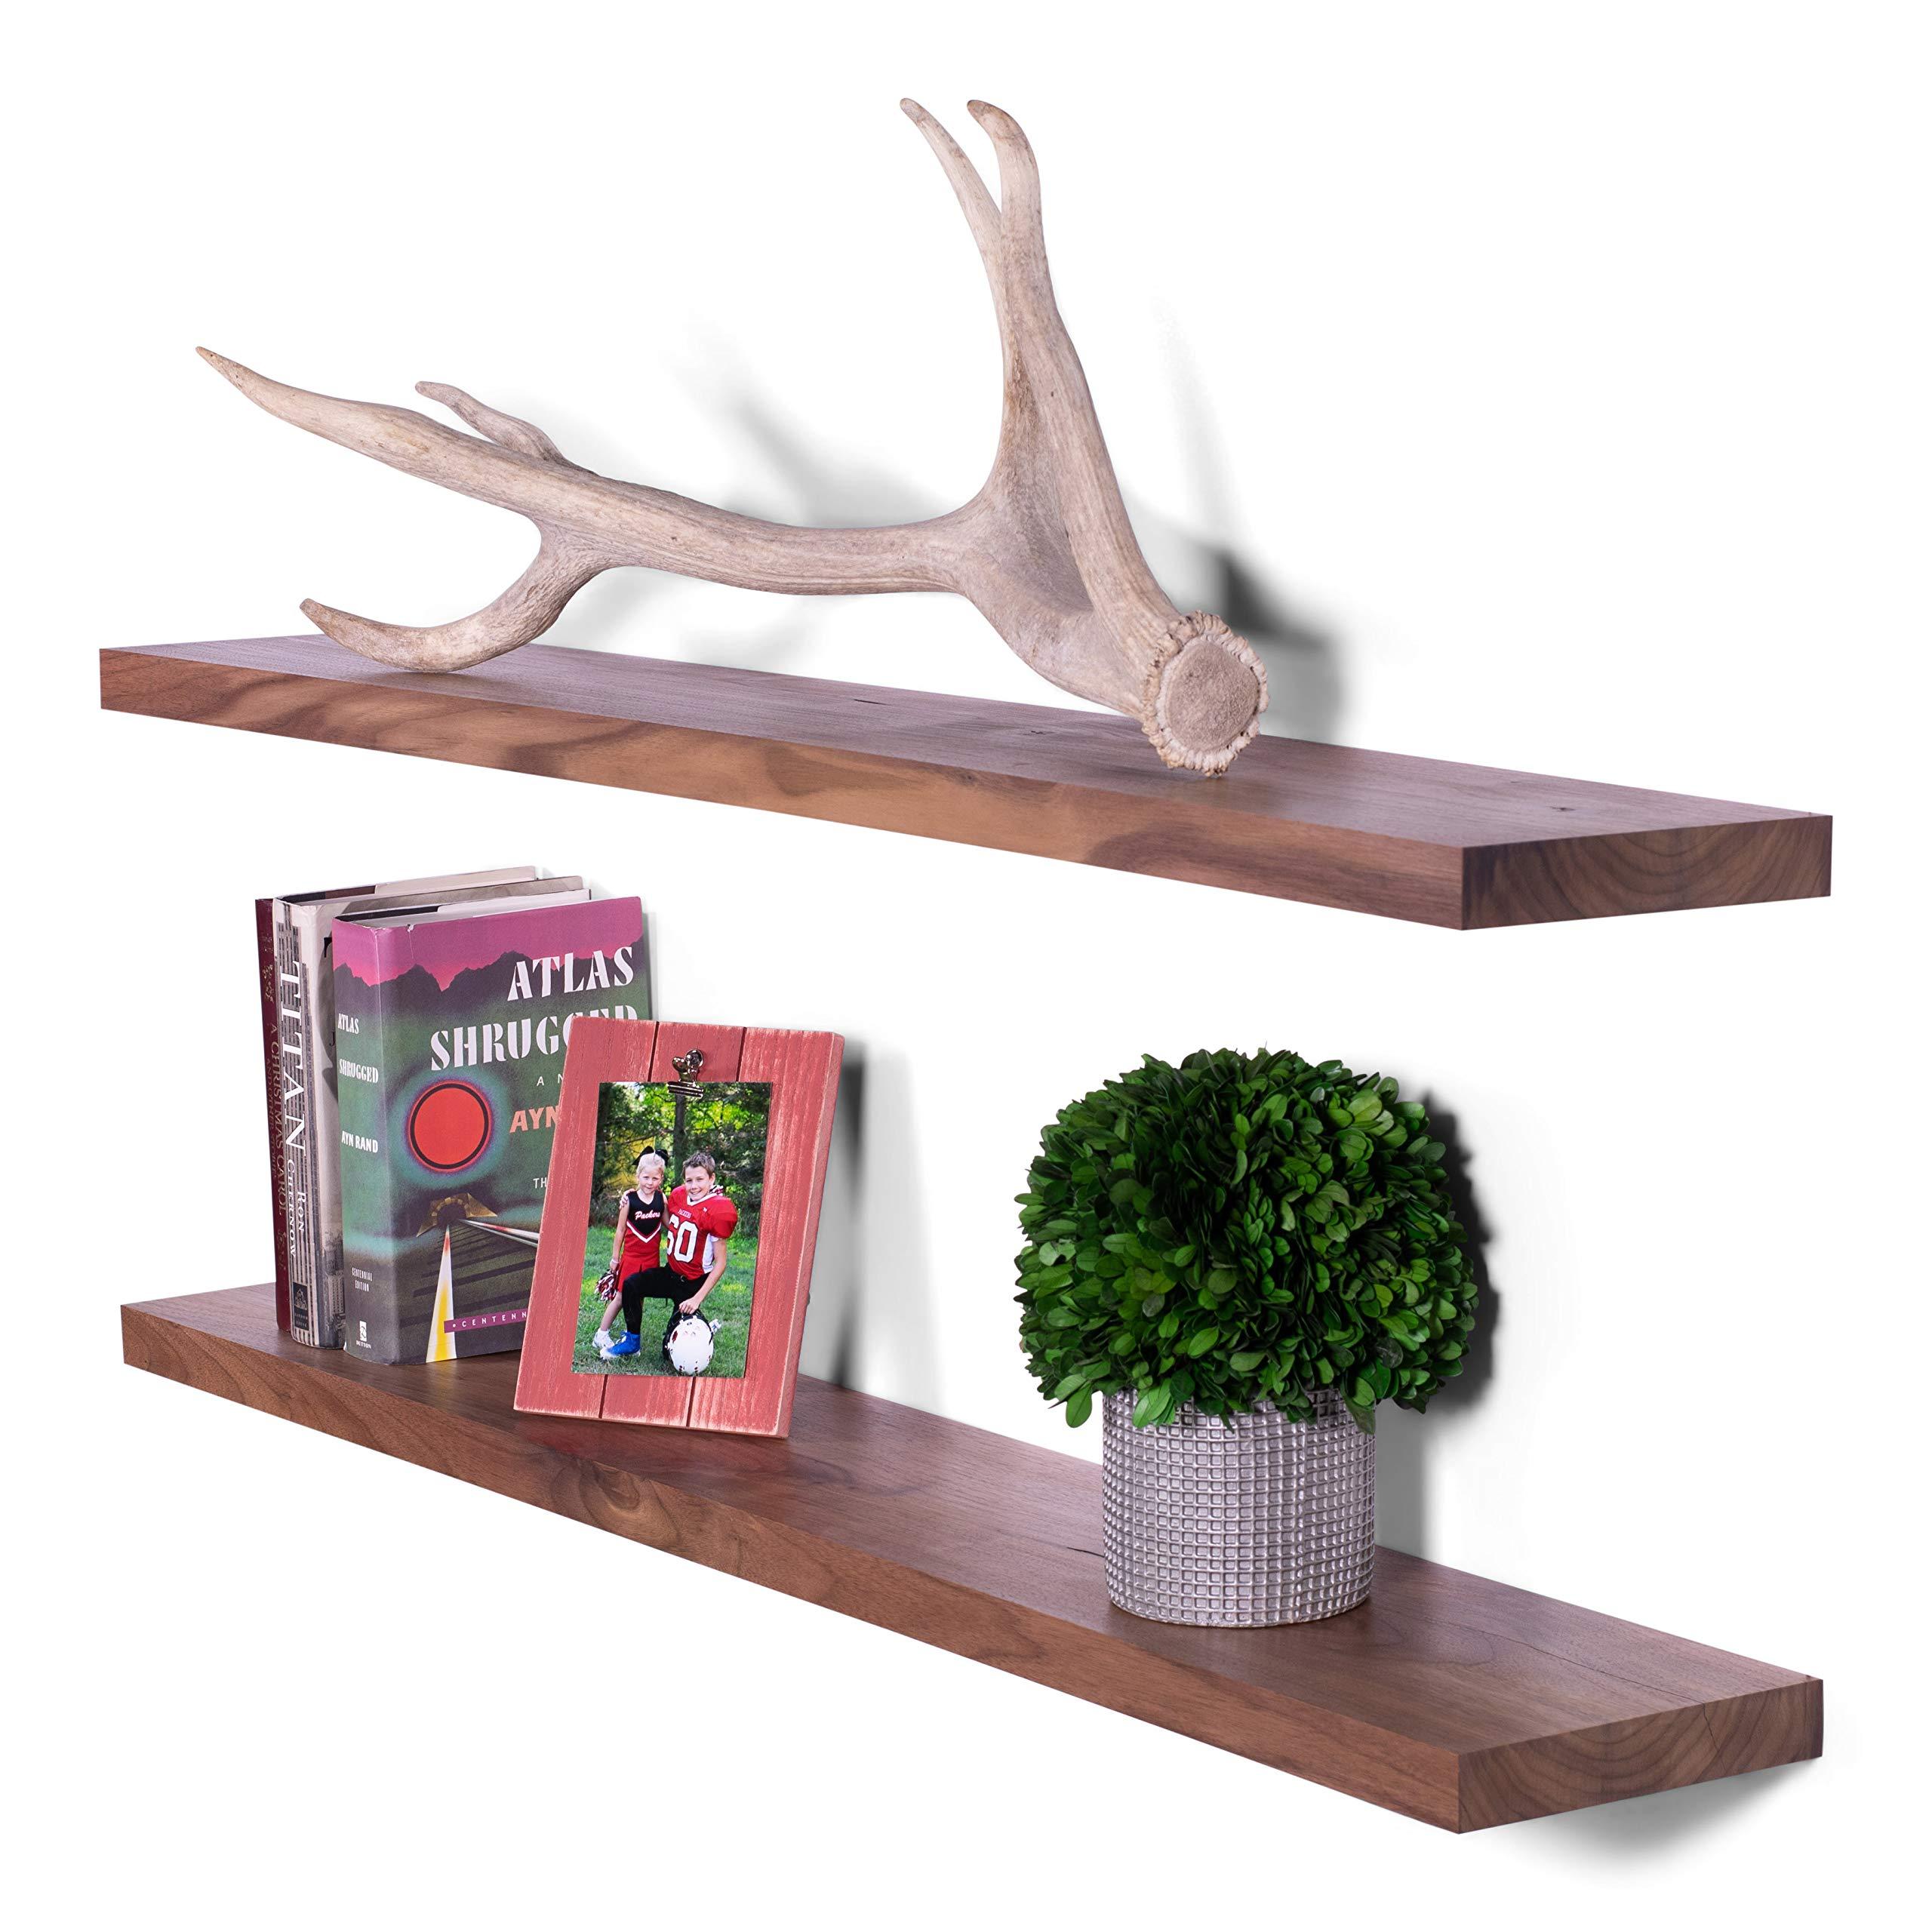 DAKODA LOVE Solid Walnut Wood Floating Shelves, USA Handmade, Clear Coat Finish, 100% Countersunk Hidden Floating Shelf Brackets (Set of 2) (48'' Long, 8'' Deep)